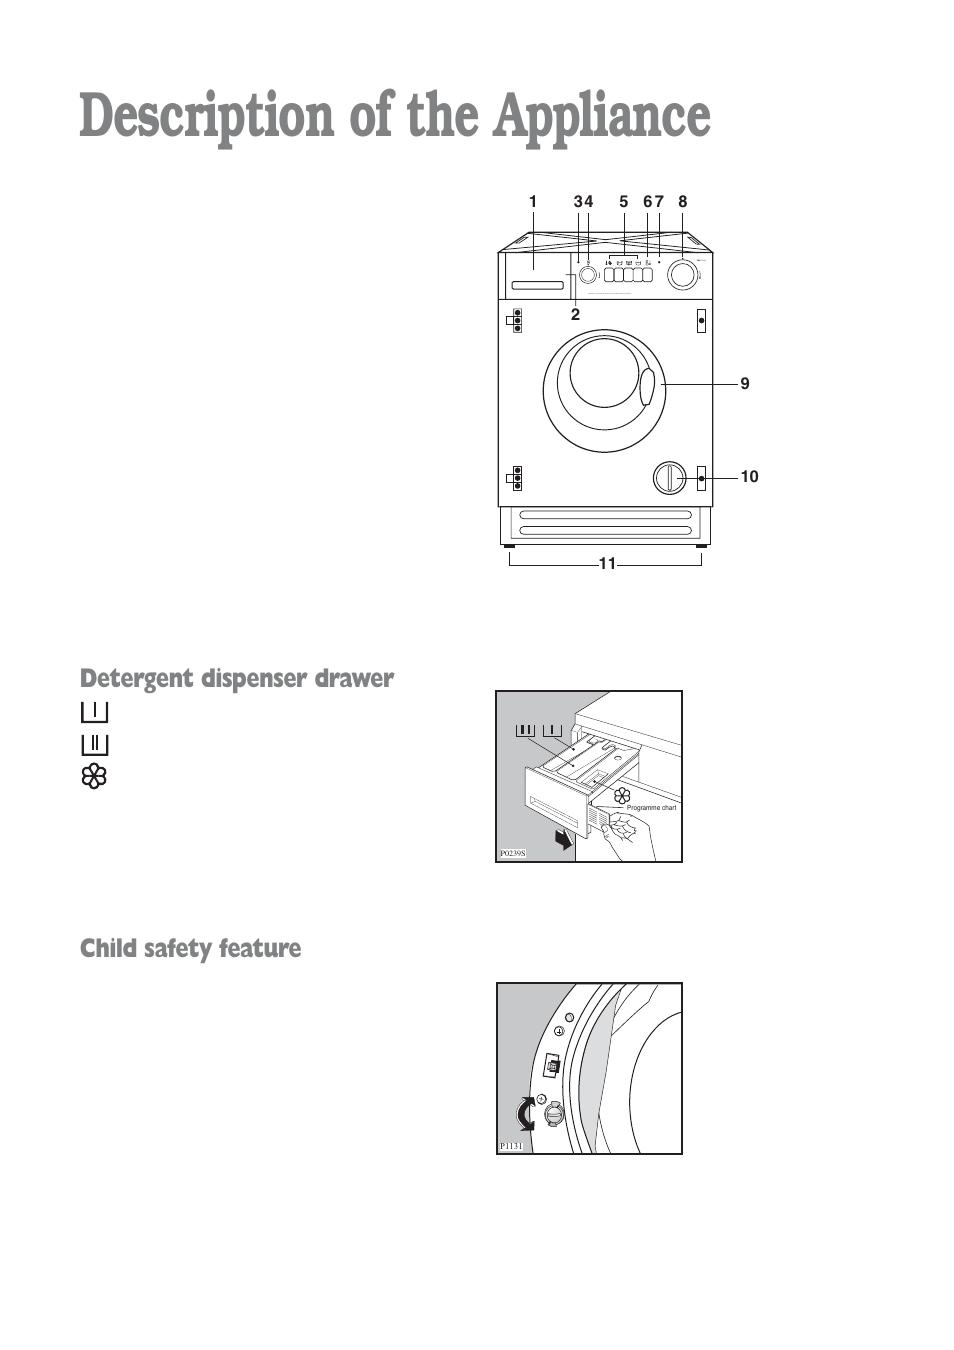 description of the appliance detergent dispenser drawer child rh manualsdir com User Manual PDF Owner's Manual